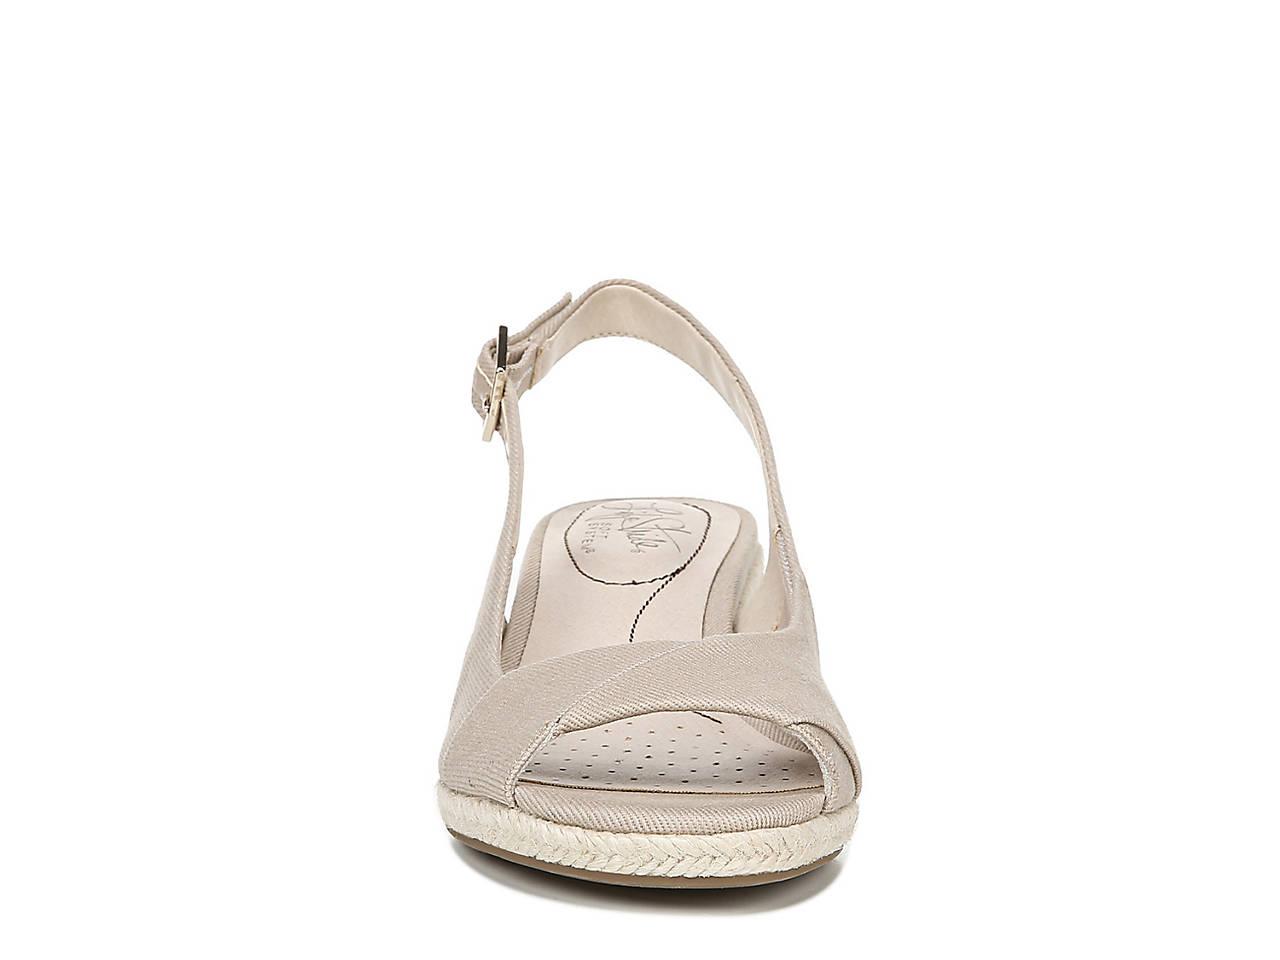 05ca3db877f Socialite Espadrille Wedge Sandal